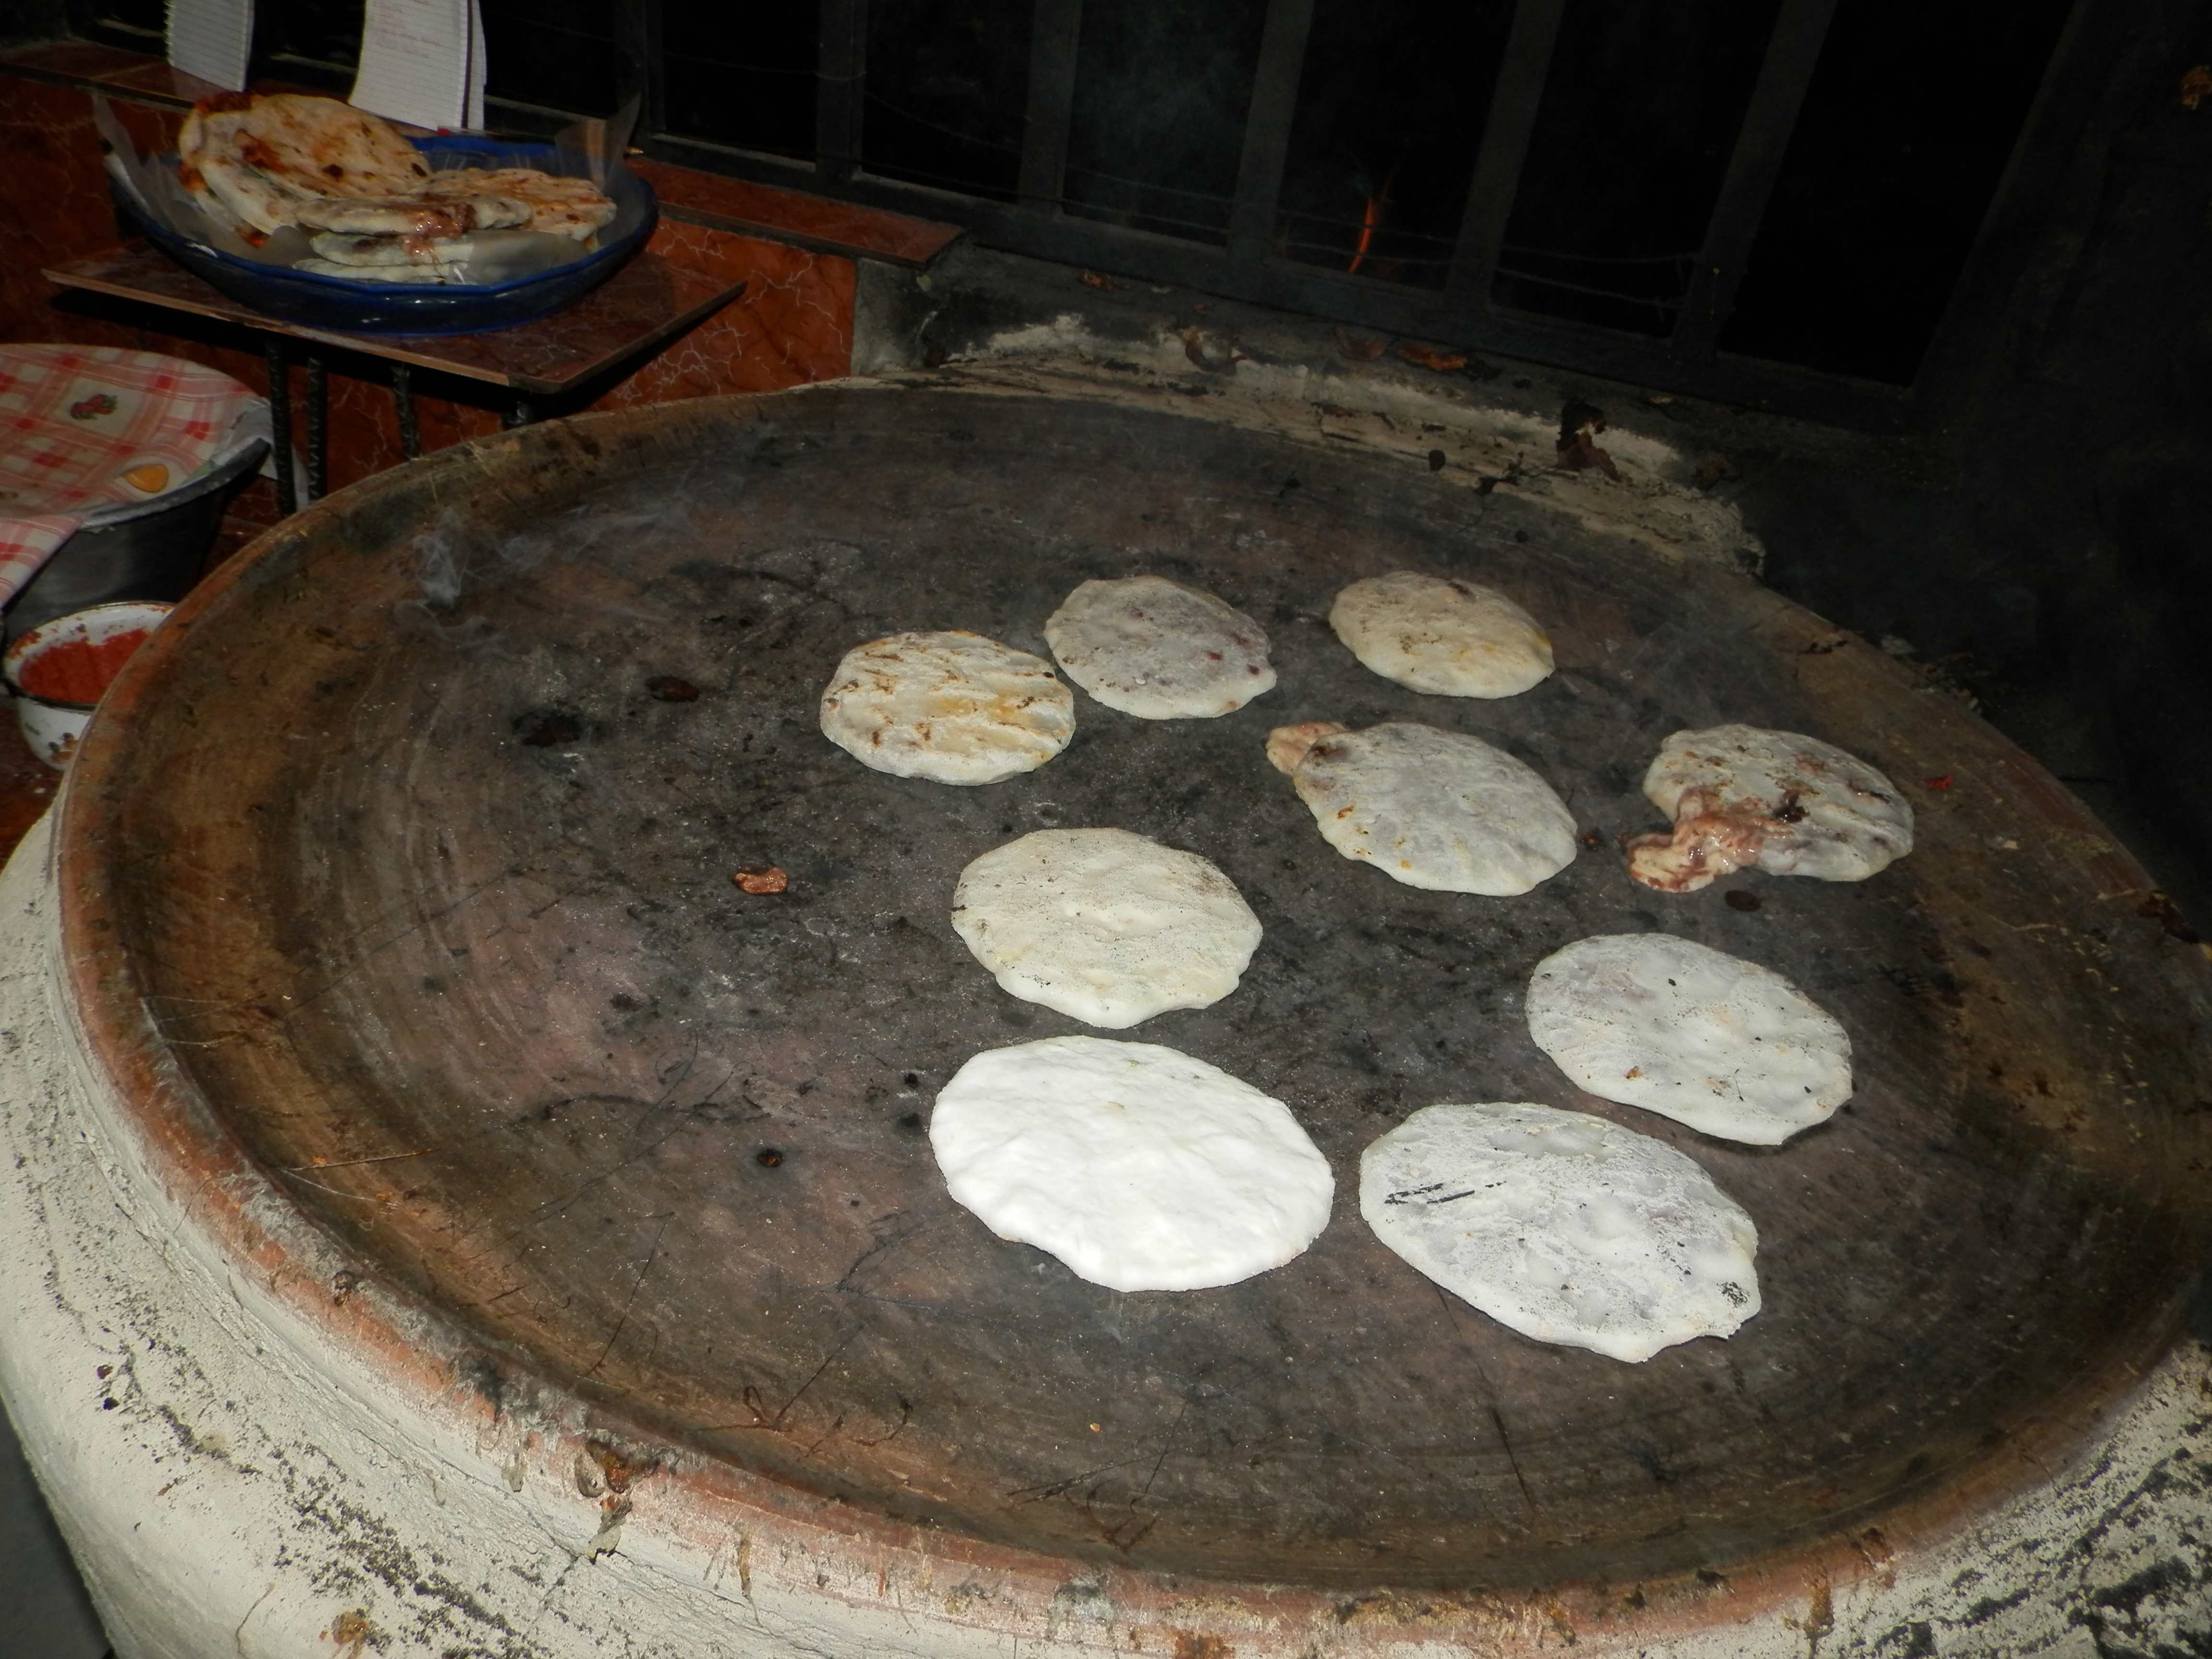 File:Pupusas en comal.JPG - Wikimedia CommonsSalvadoran Pupusas On Indian School